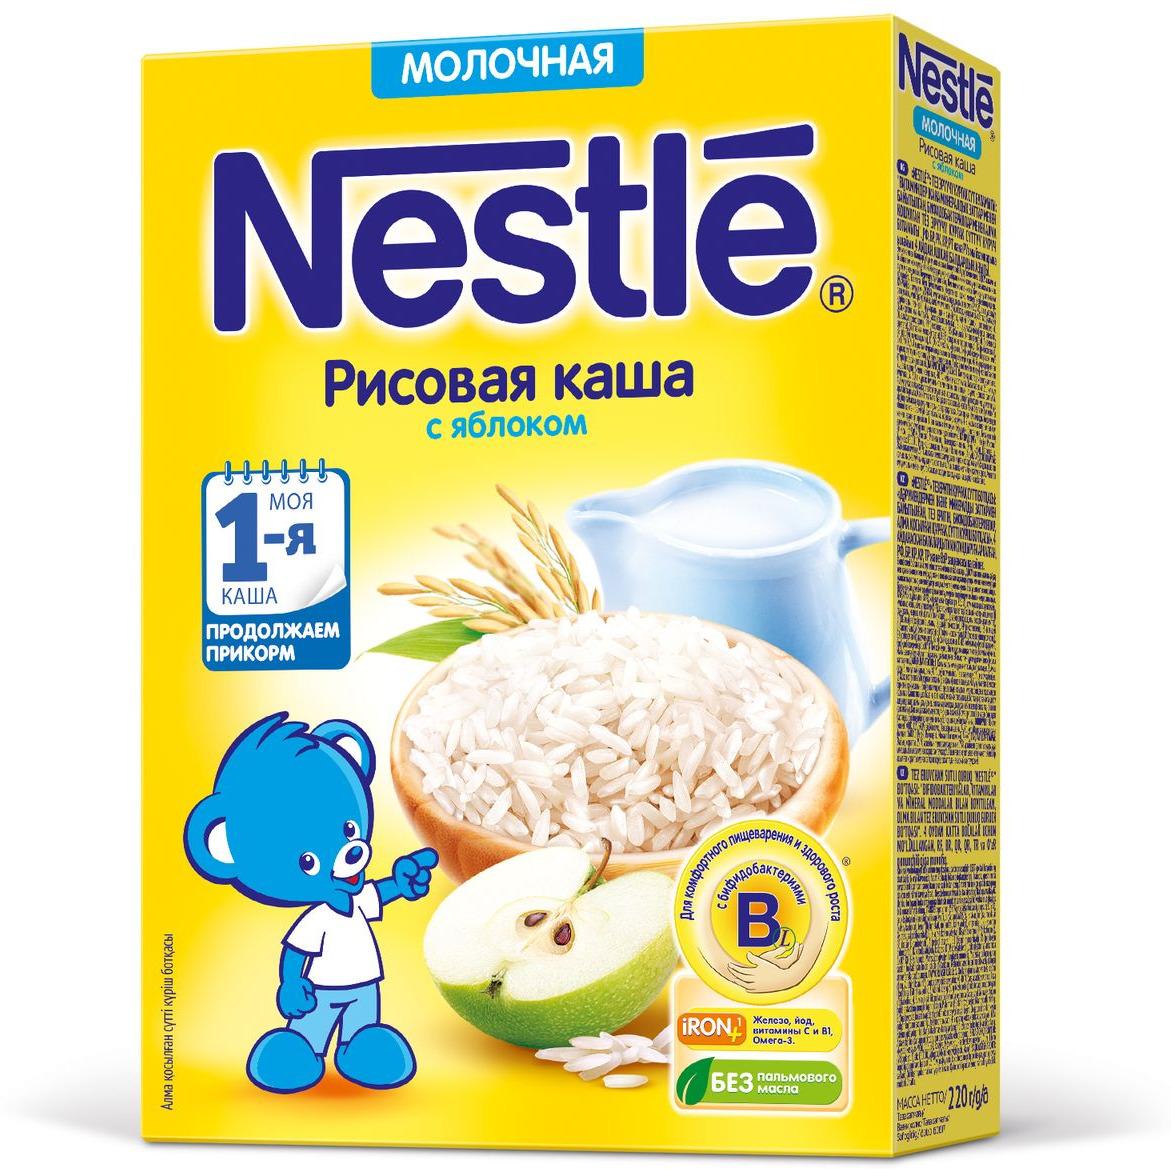 Nestle рисовая с яблоком каша молочная, 220 г